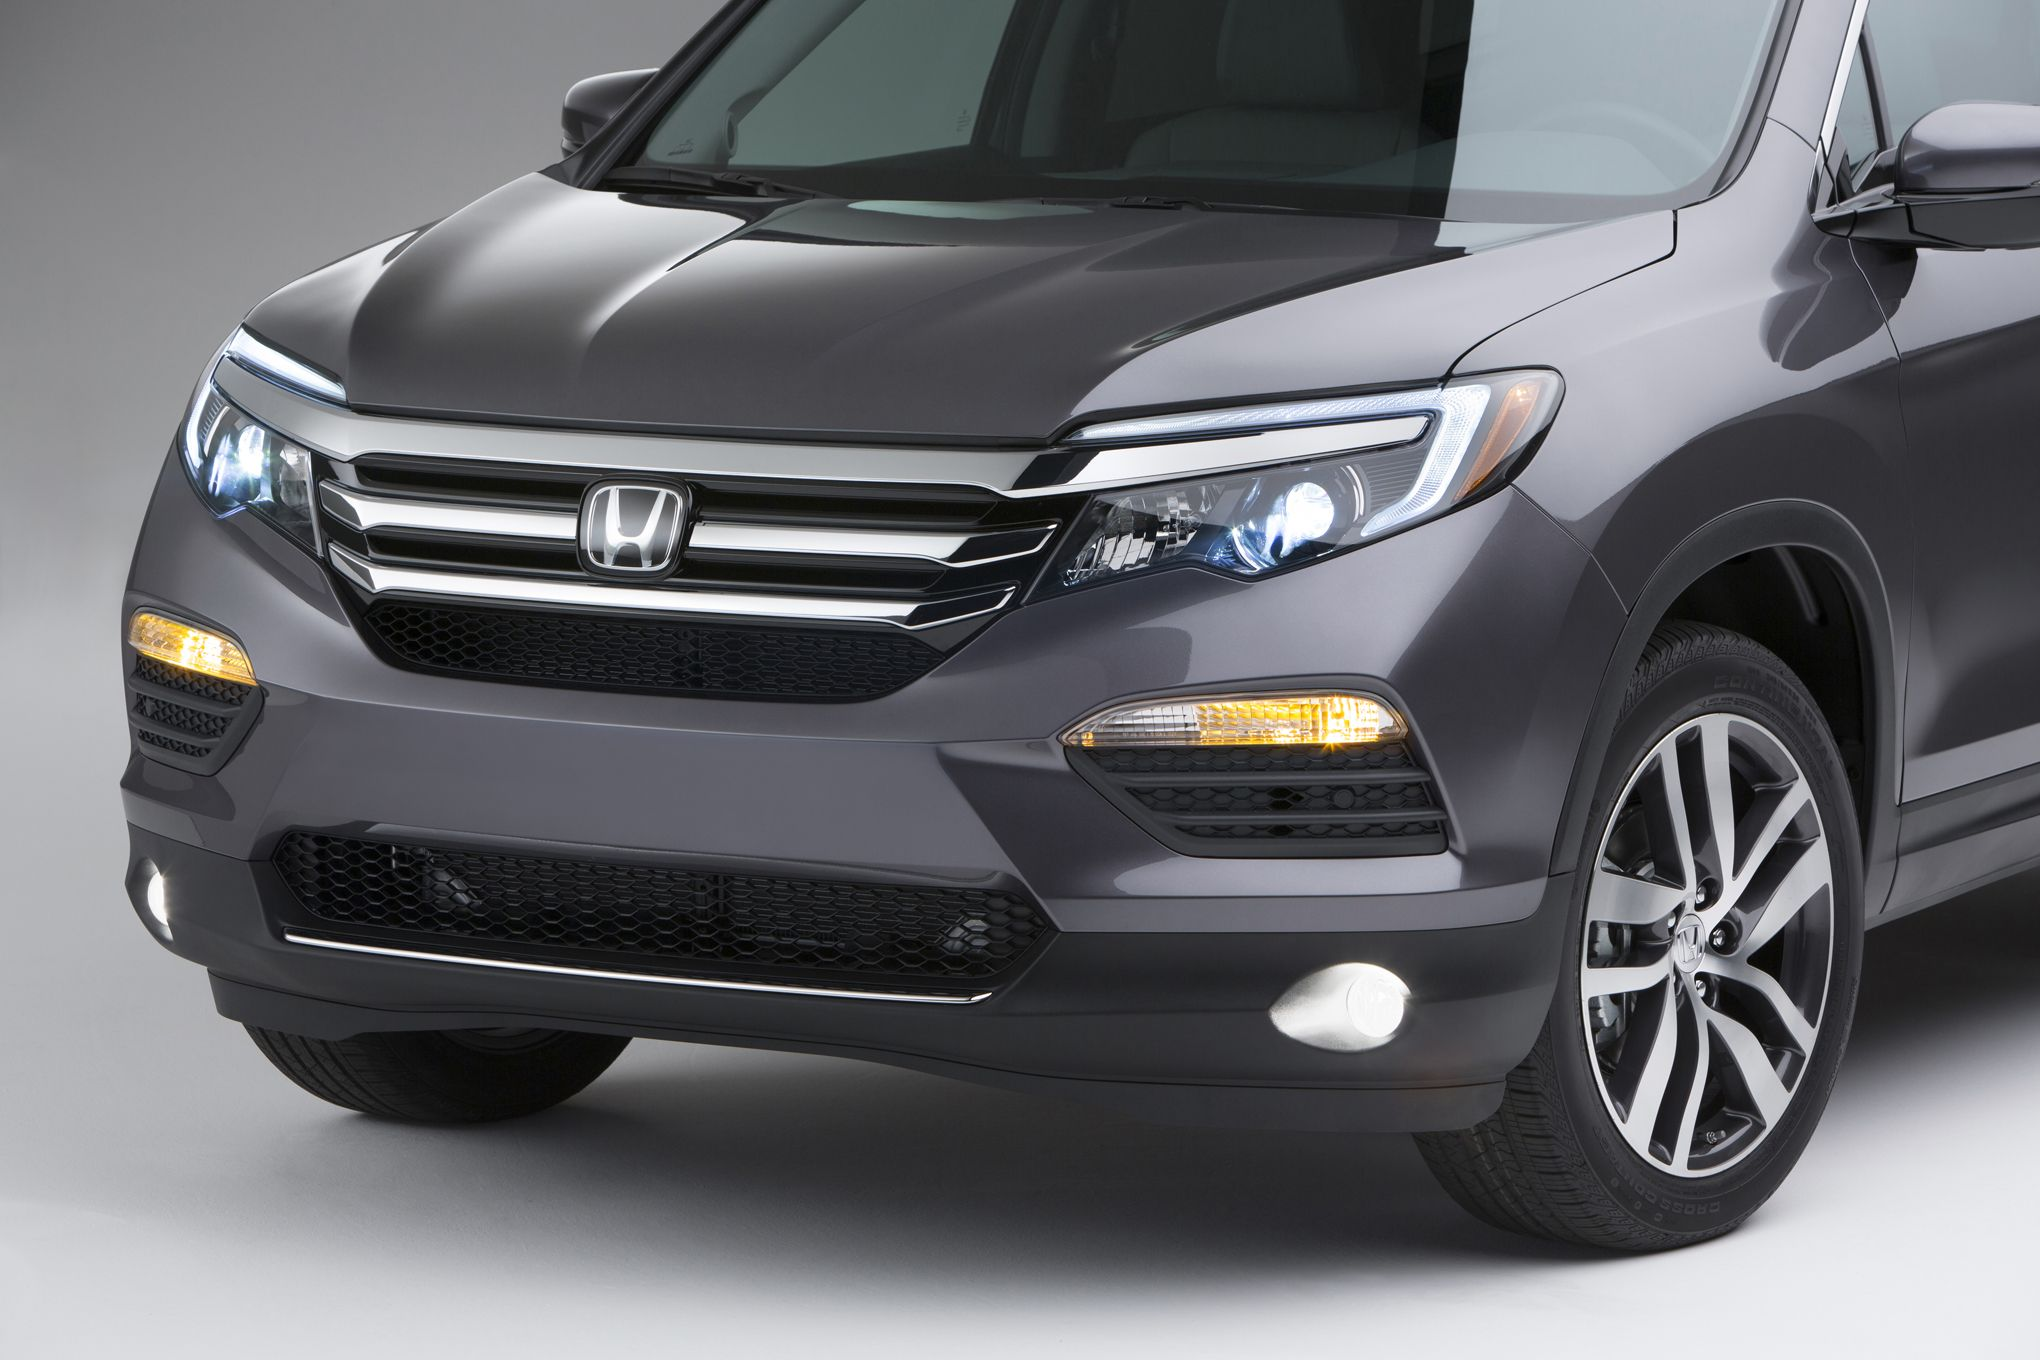 2017 Honda Pilot Specs And Release Date Http Newautocarhq